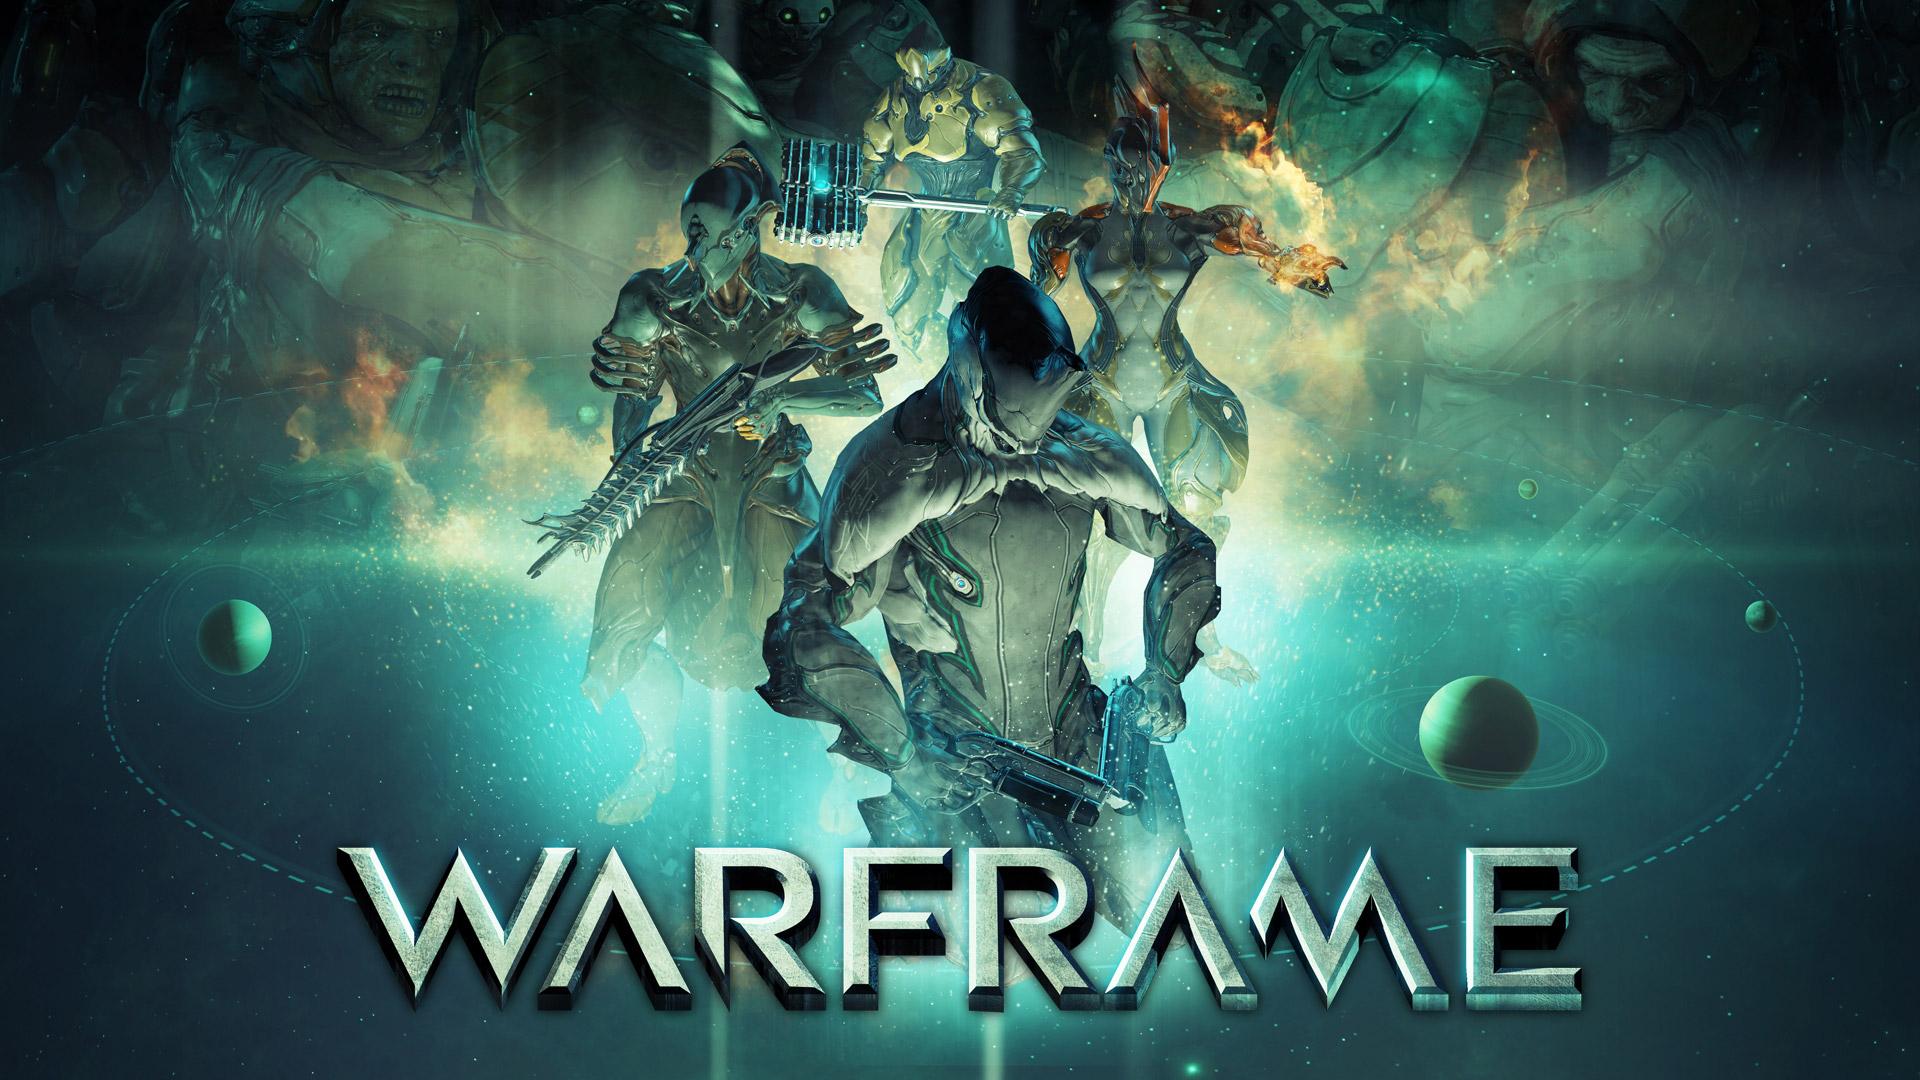 Warframe wallpaper 1